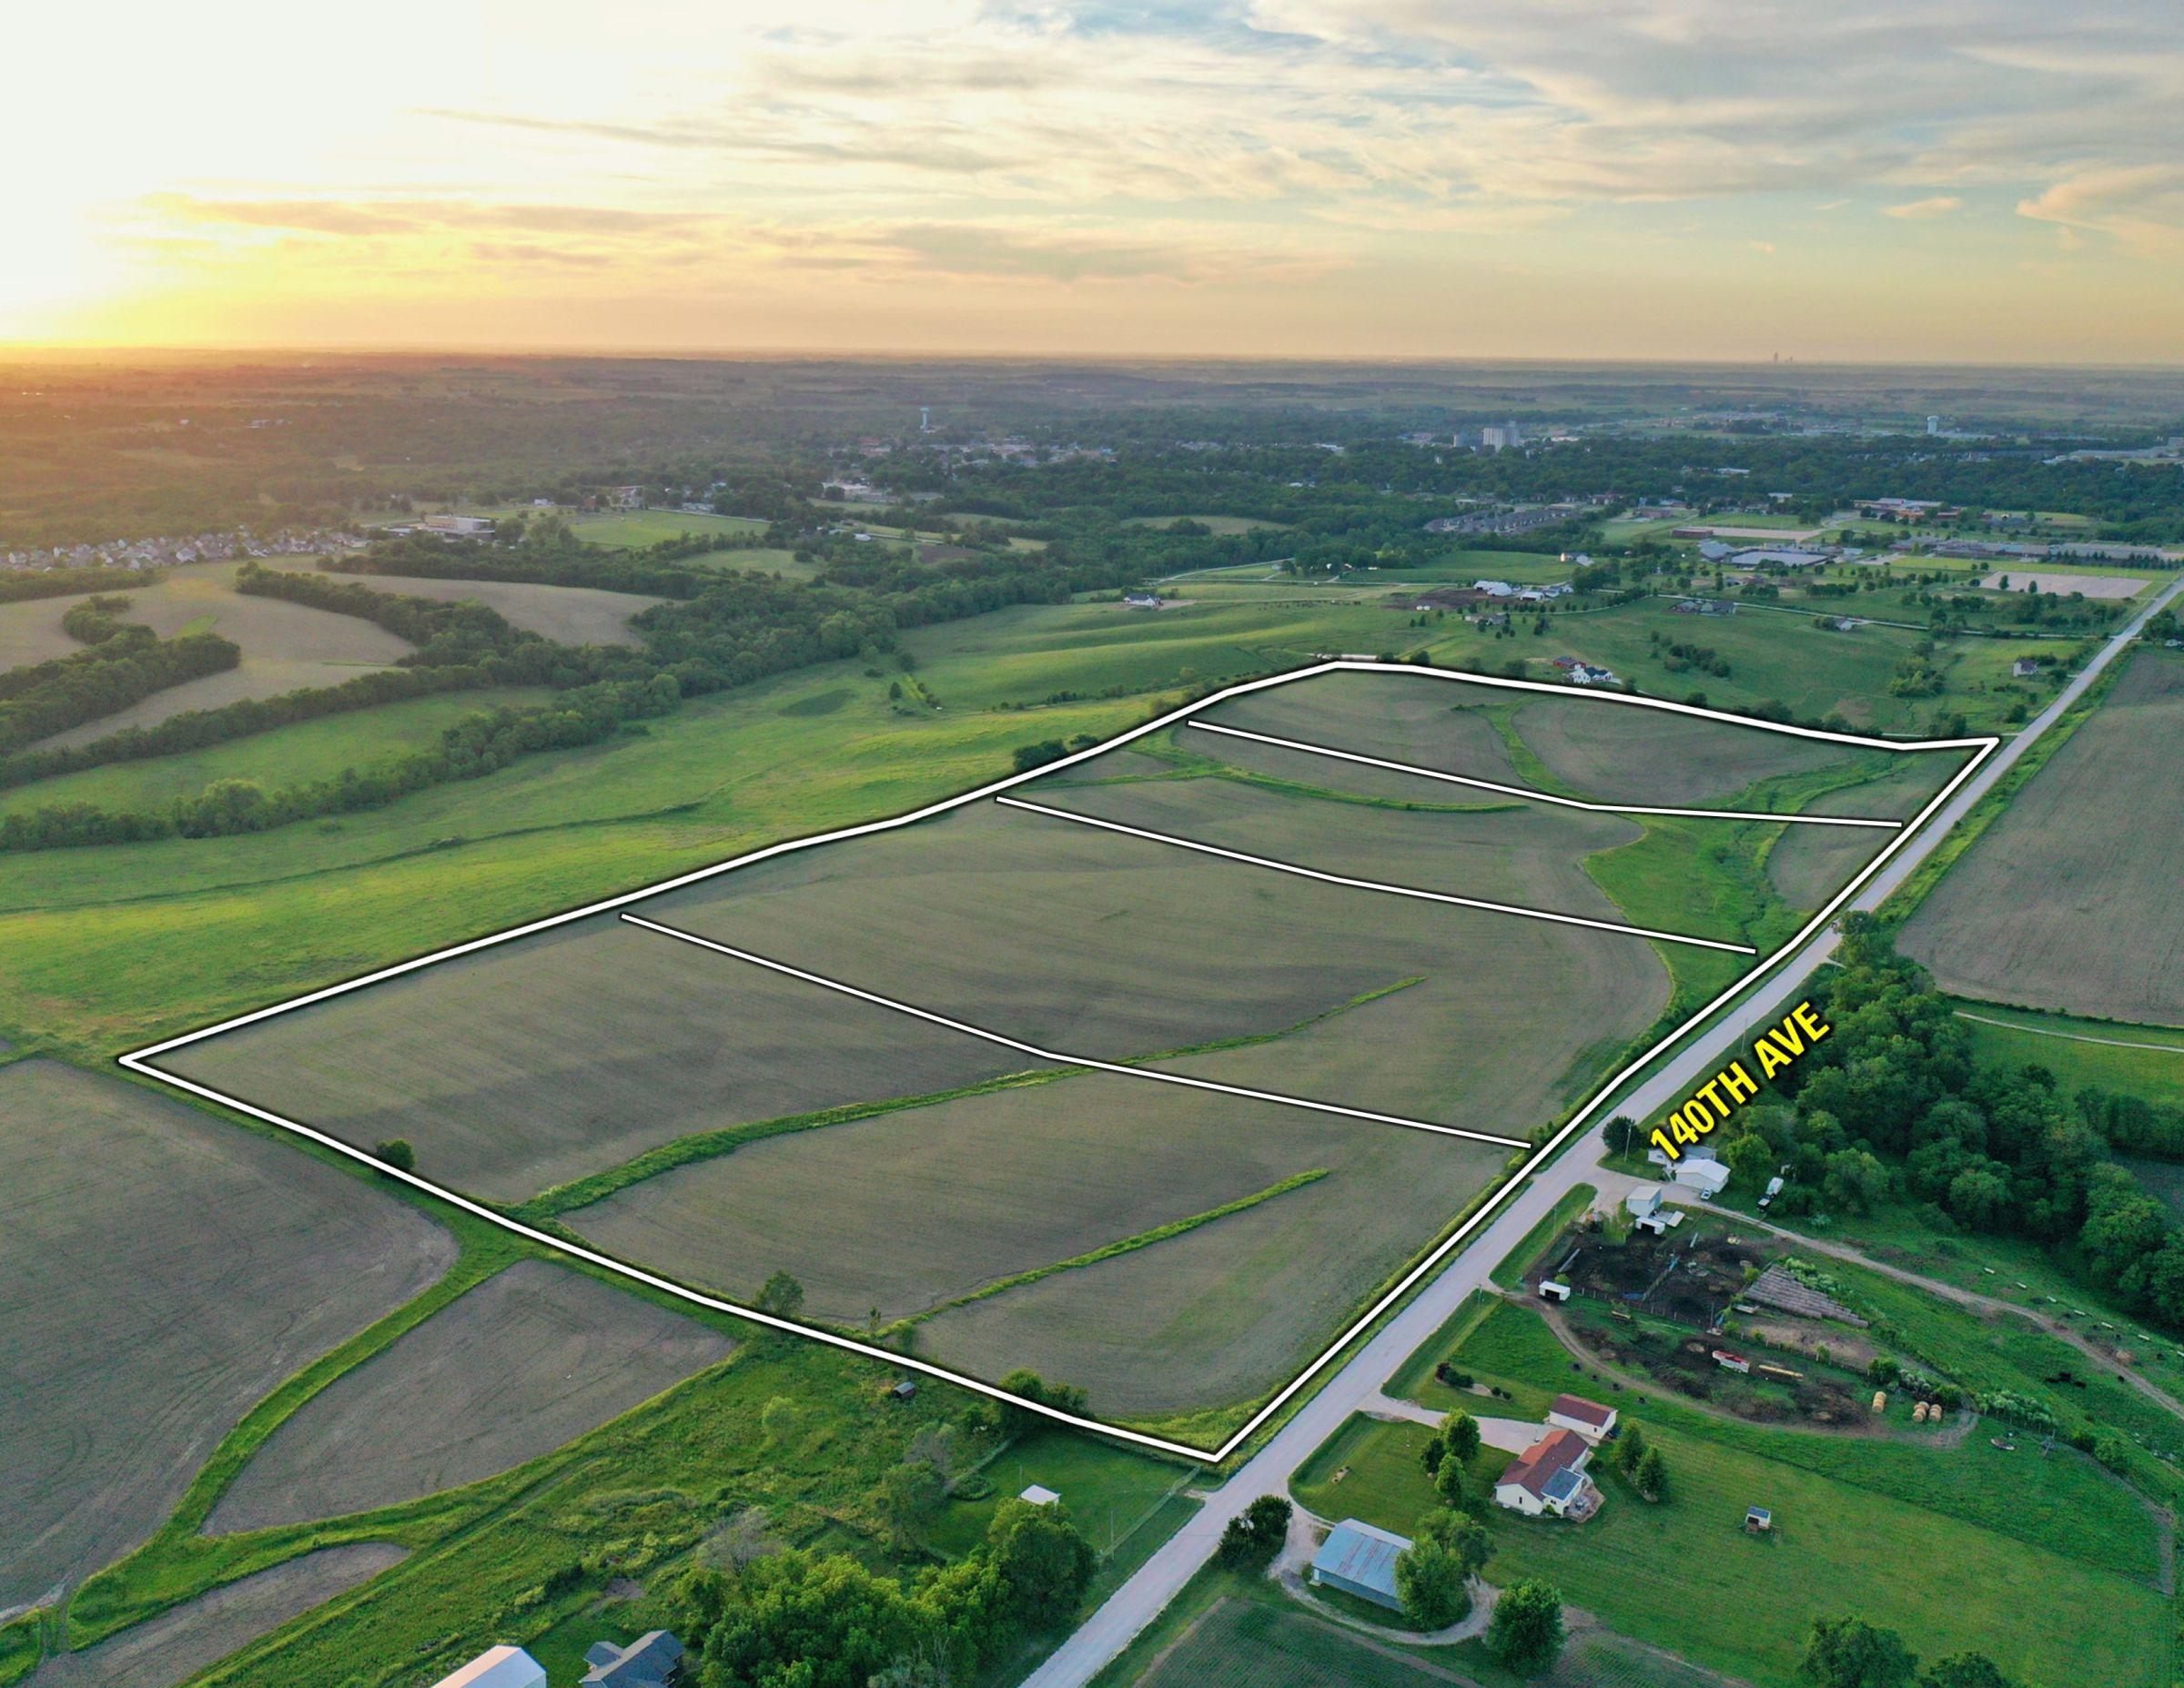 development-land-warren-county-iowa-20-acres-listing-number-15426-3-2021-03-26-185634.jpg